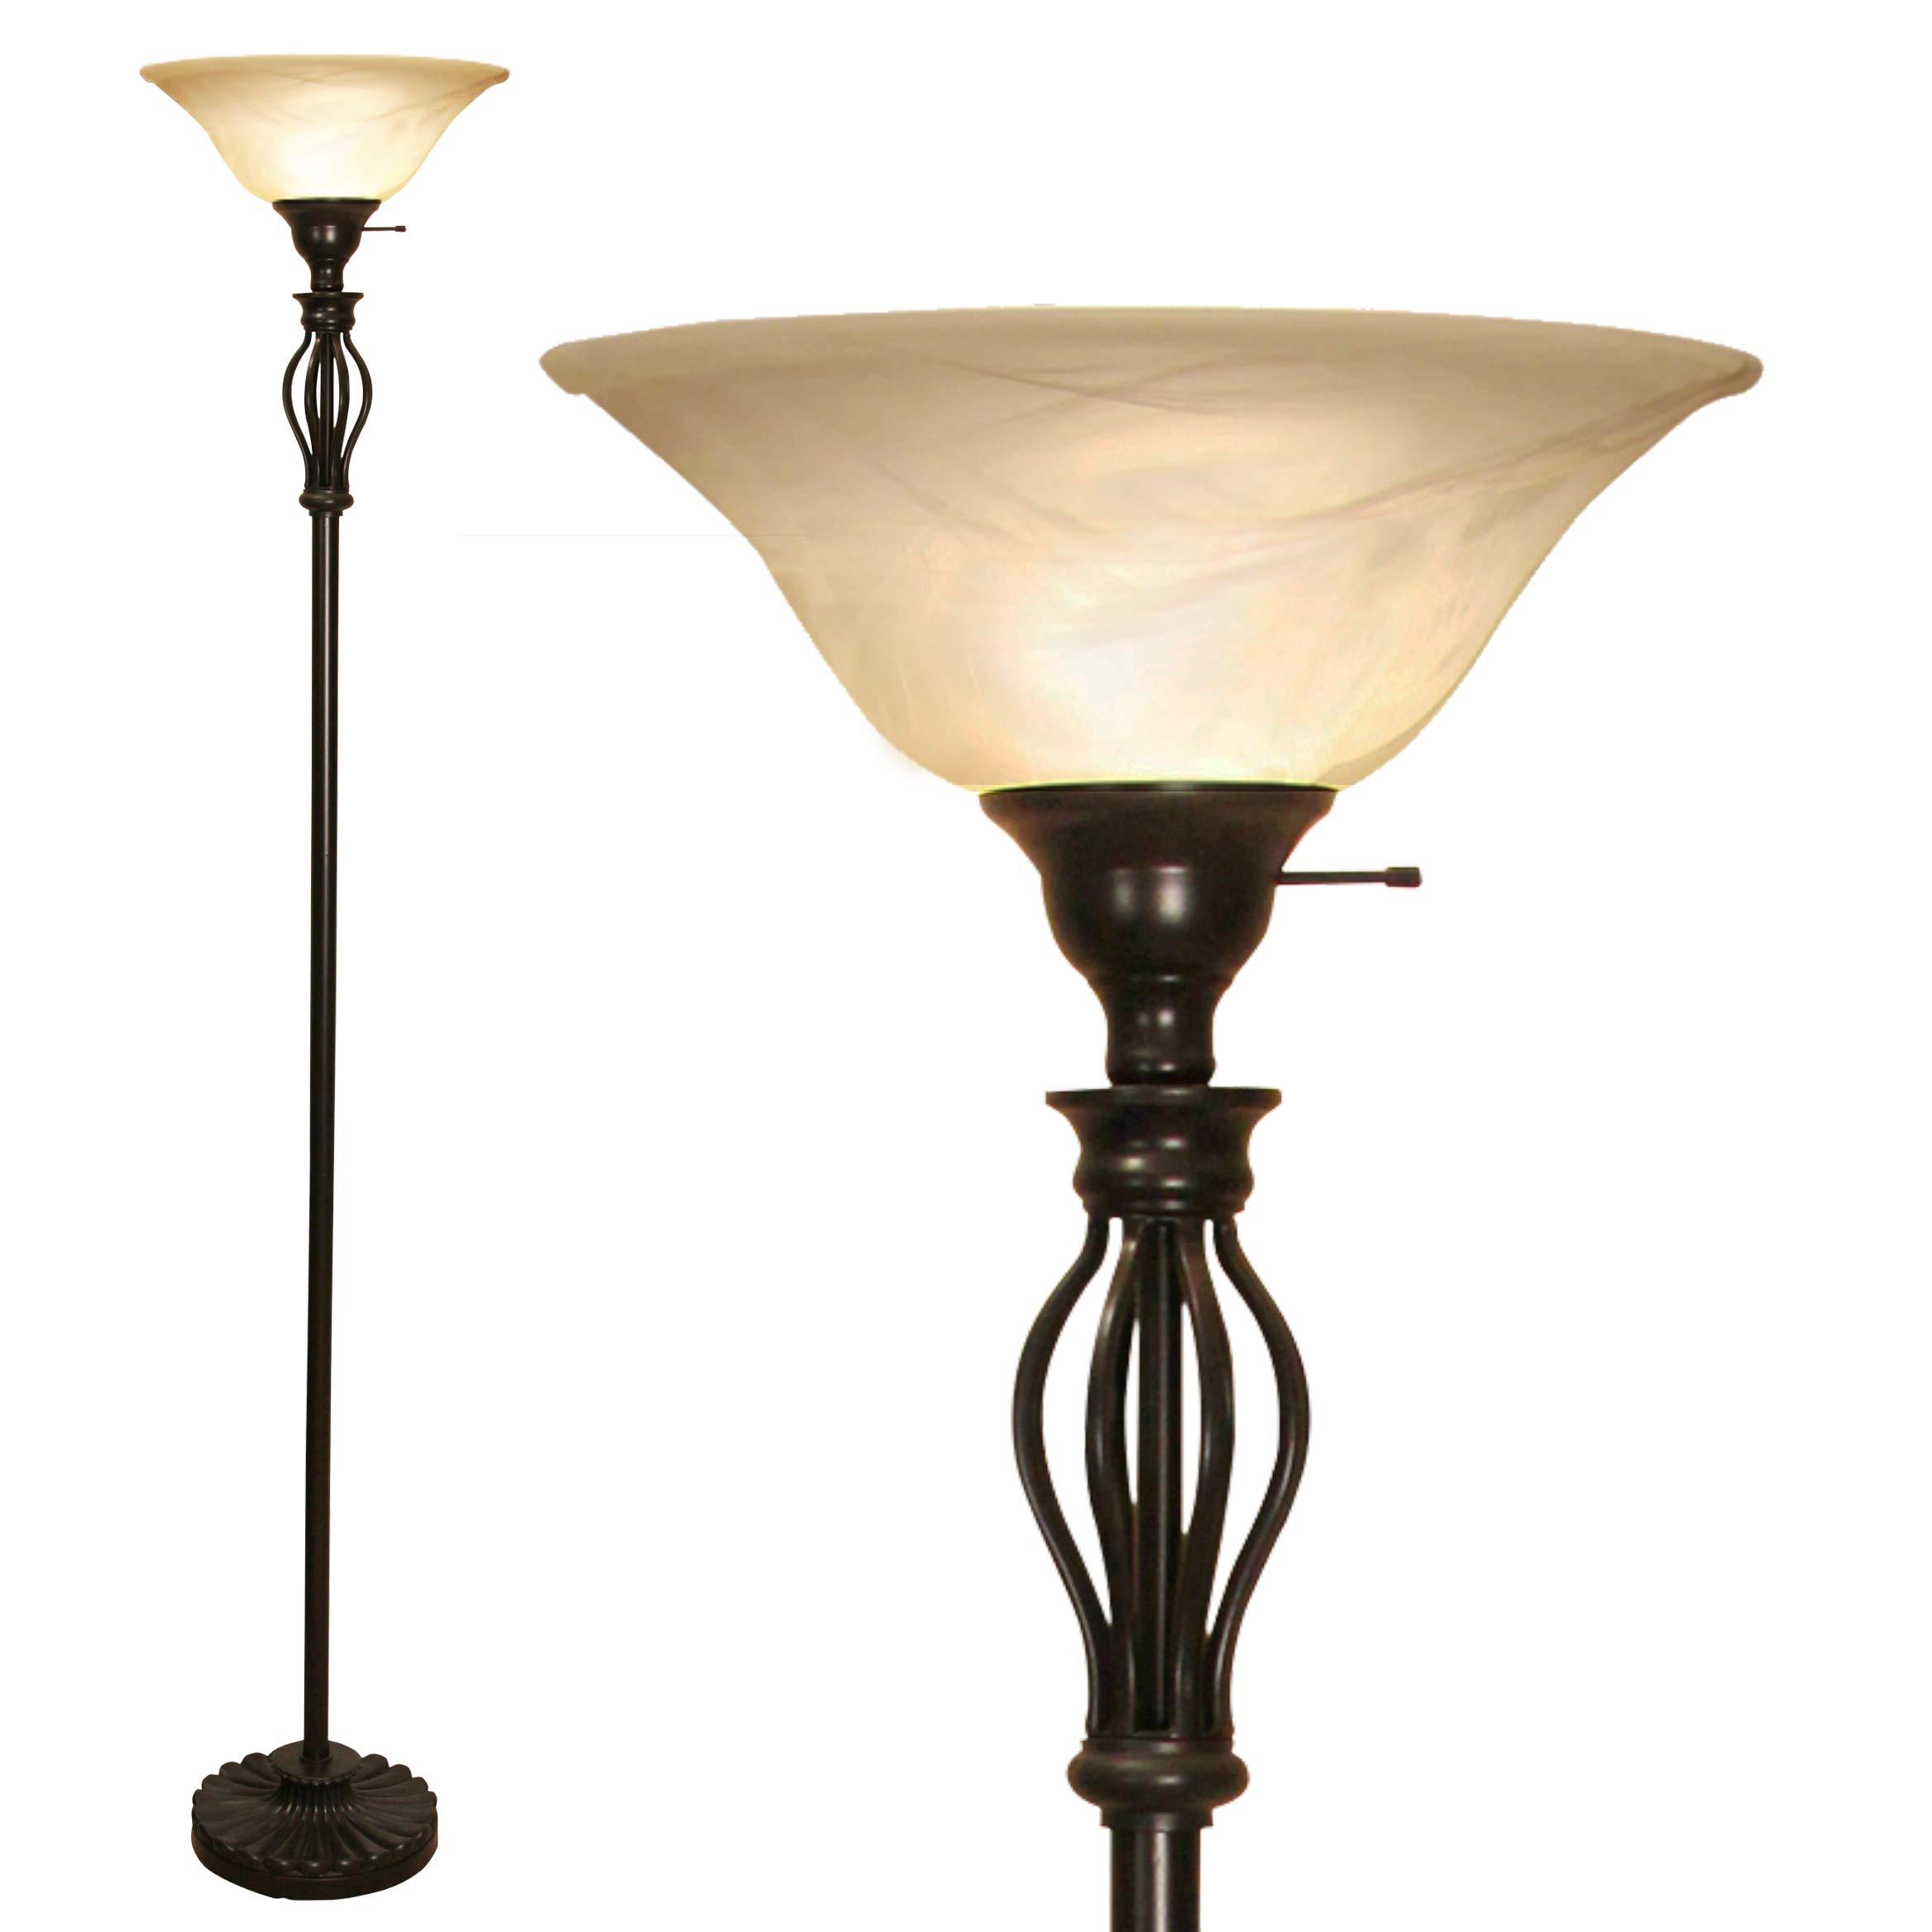 Light Accents Floor Lamp Tall